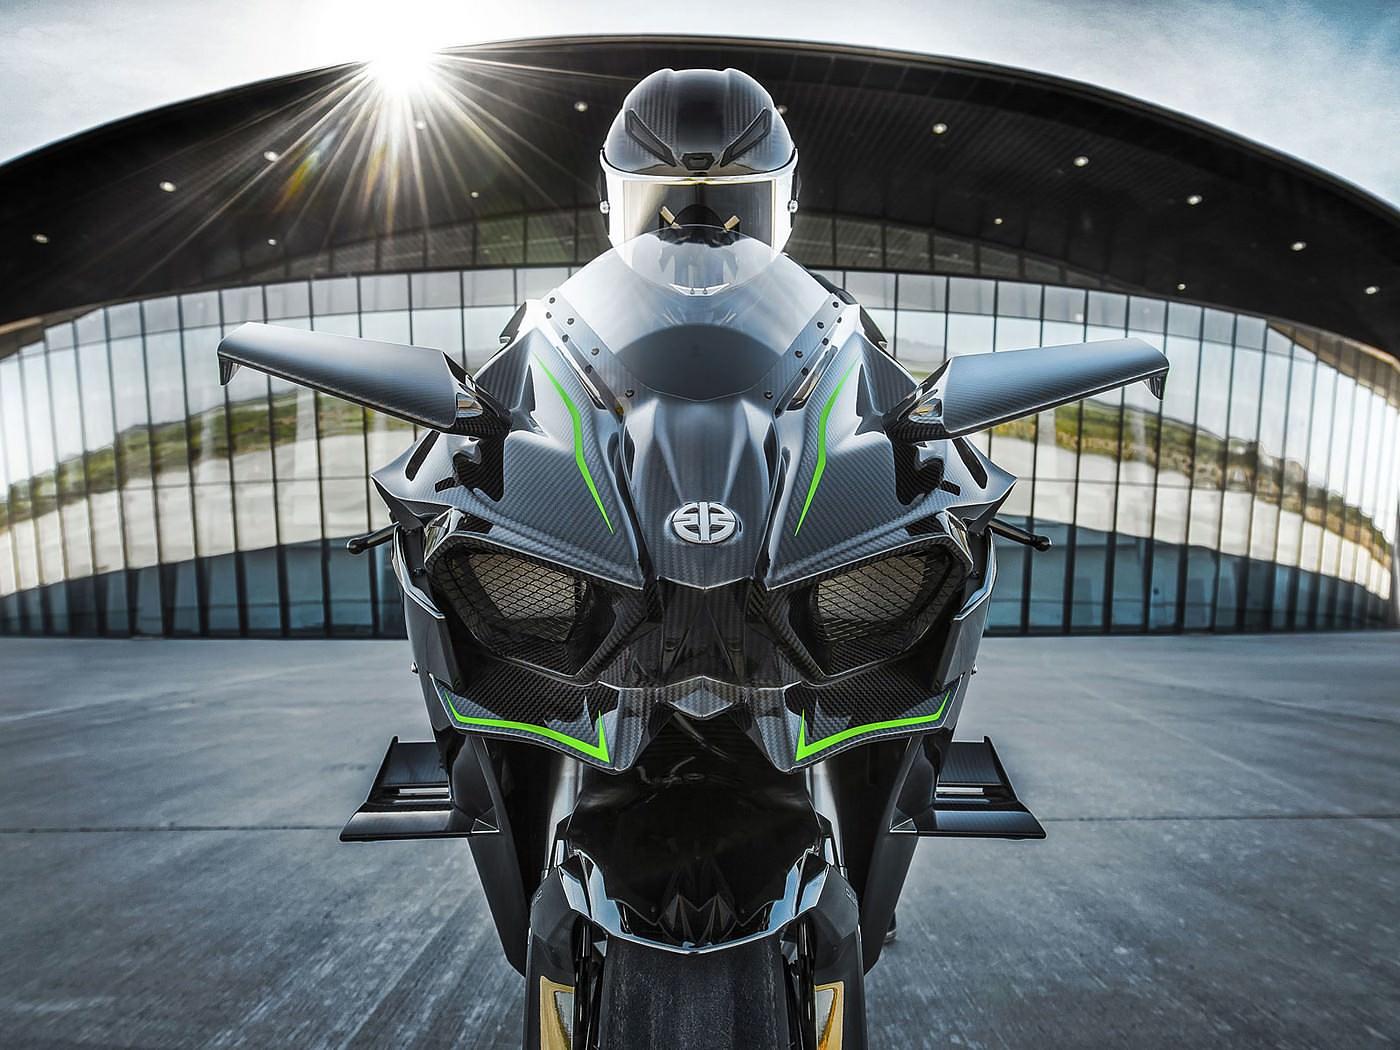 Kawasaki Ninja H2R Supercharged Superbike